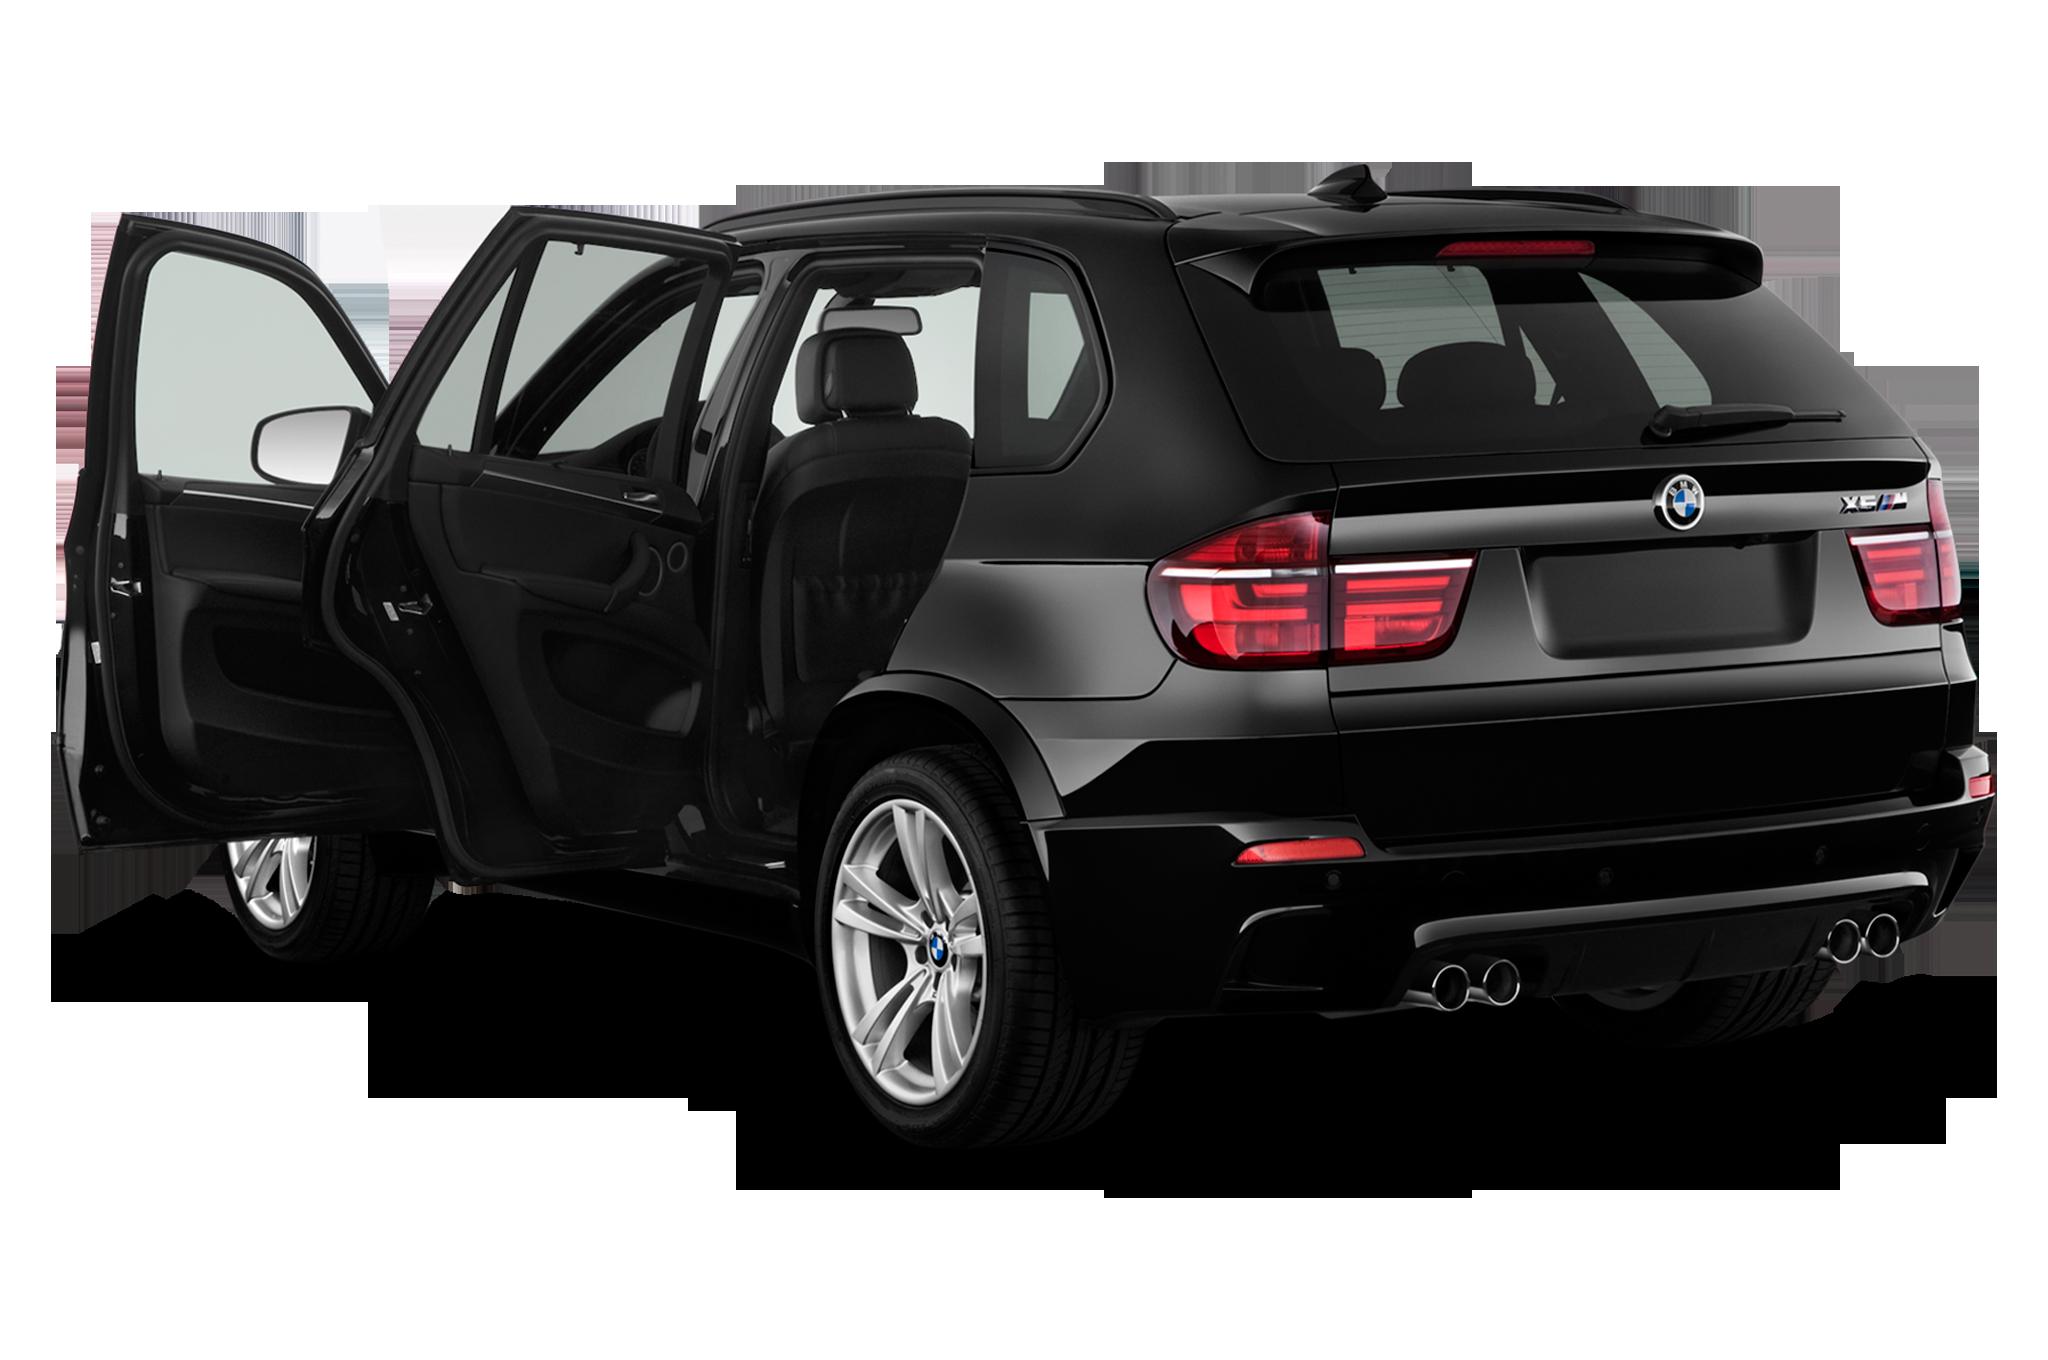 2012 BMW X5 M  Editors Notebook  Automobile Magazine